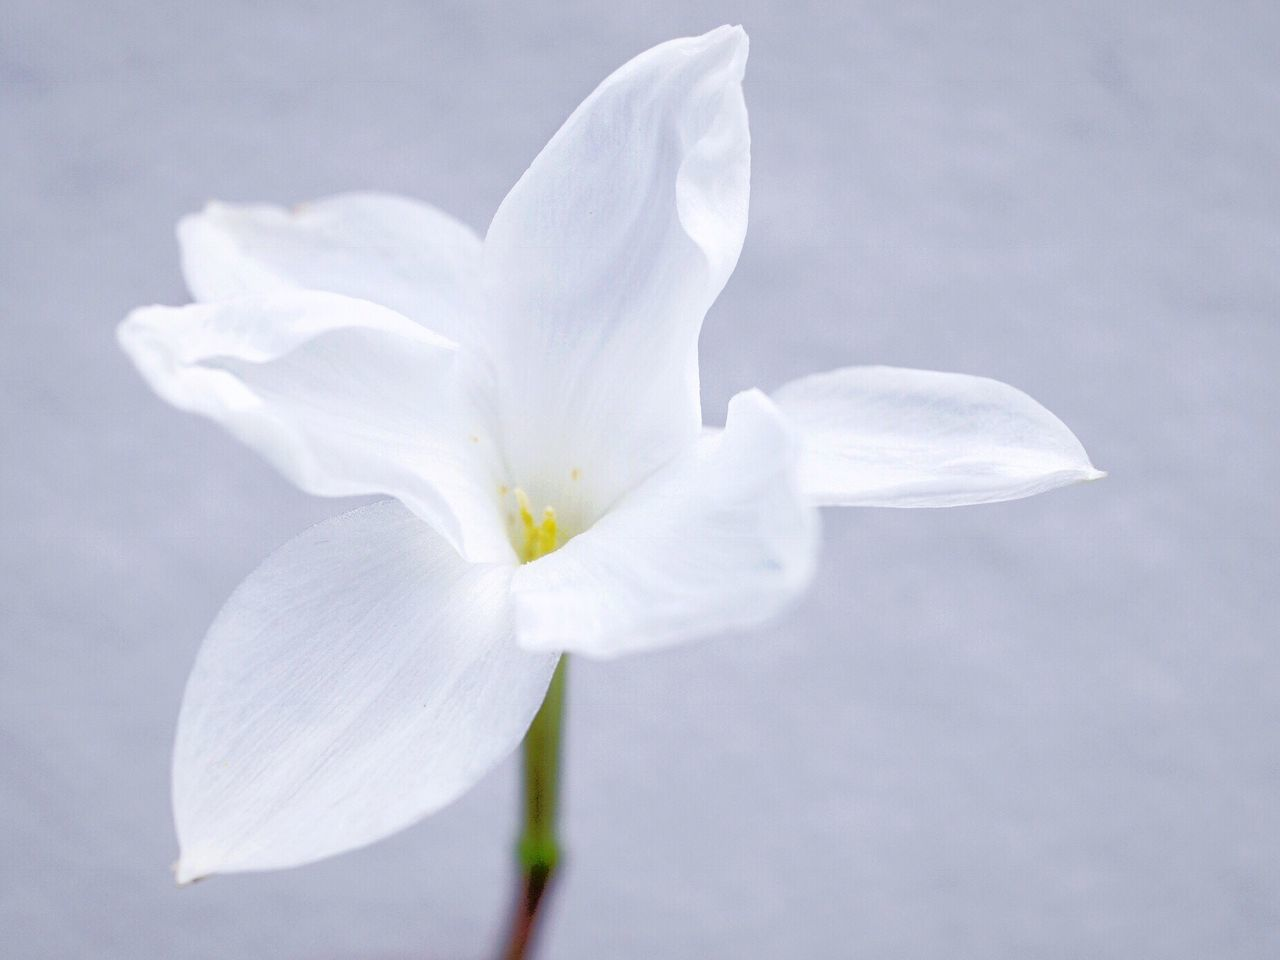 Zephyranthus drummondii Flower White Flower Simplicity Flower Collection Flowerporn Light And Shadow EyeEm Nature Lover